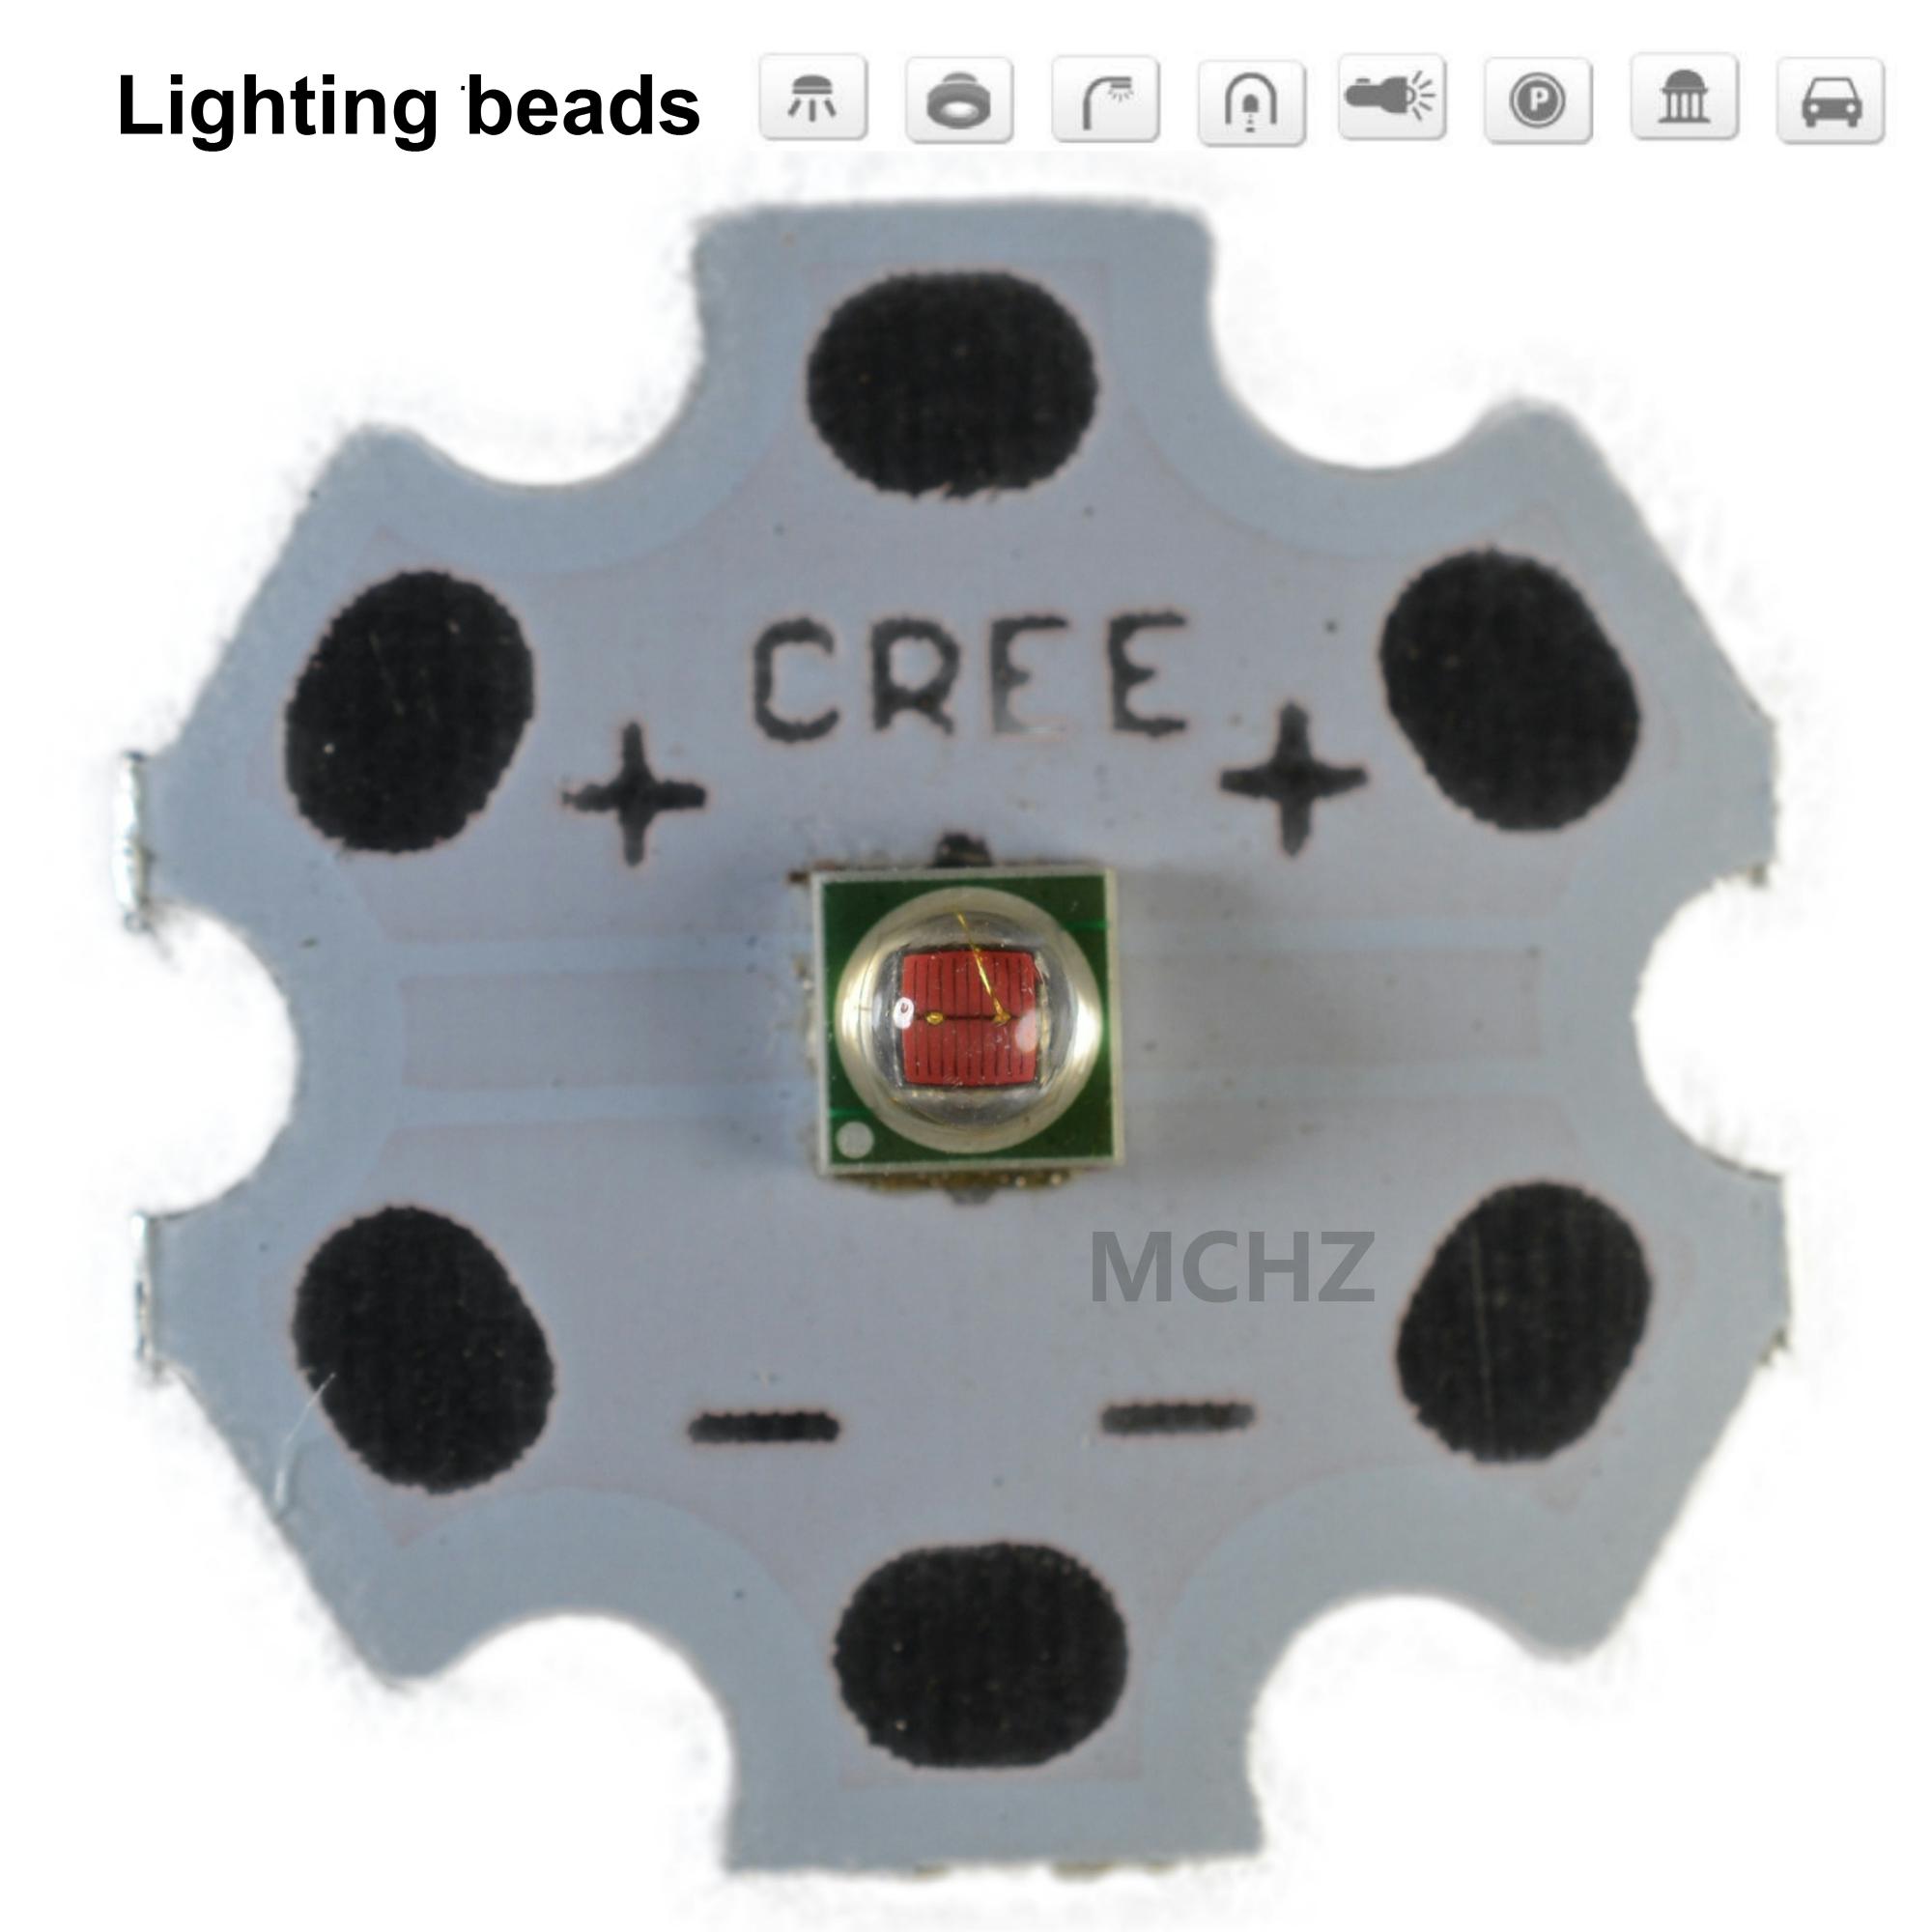 100pcs 3535 2.5W 2V-2.6V Perpetual lamp 620-625nm